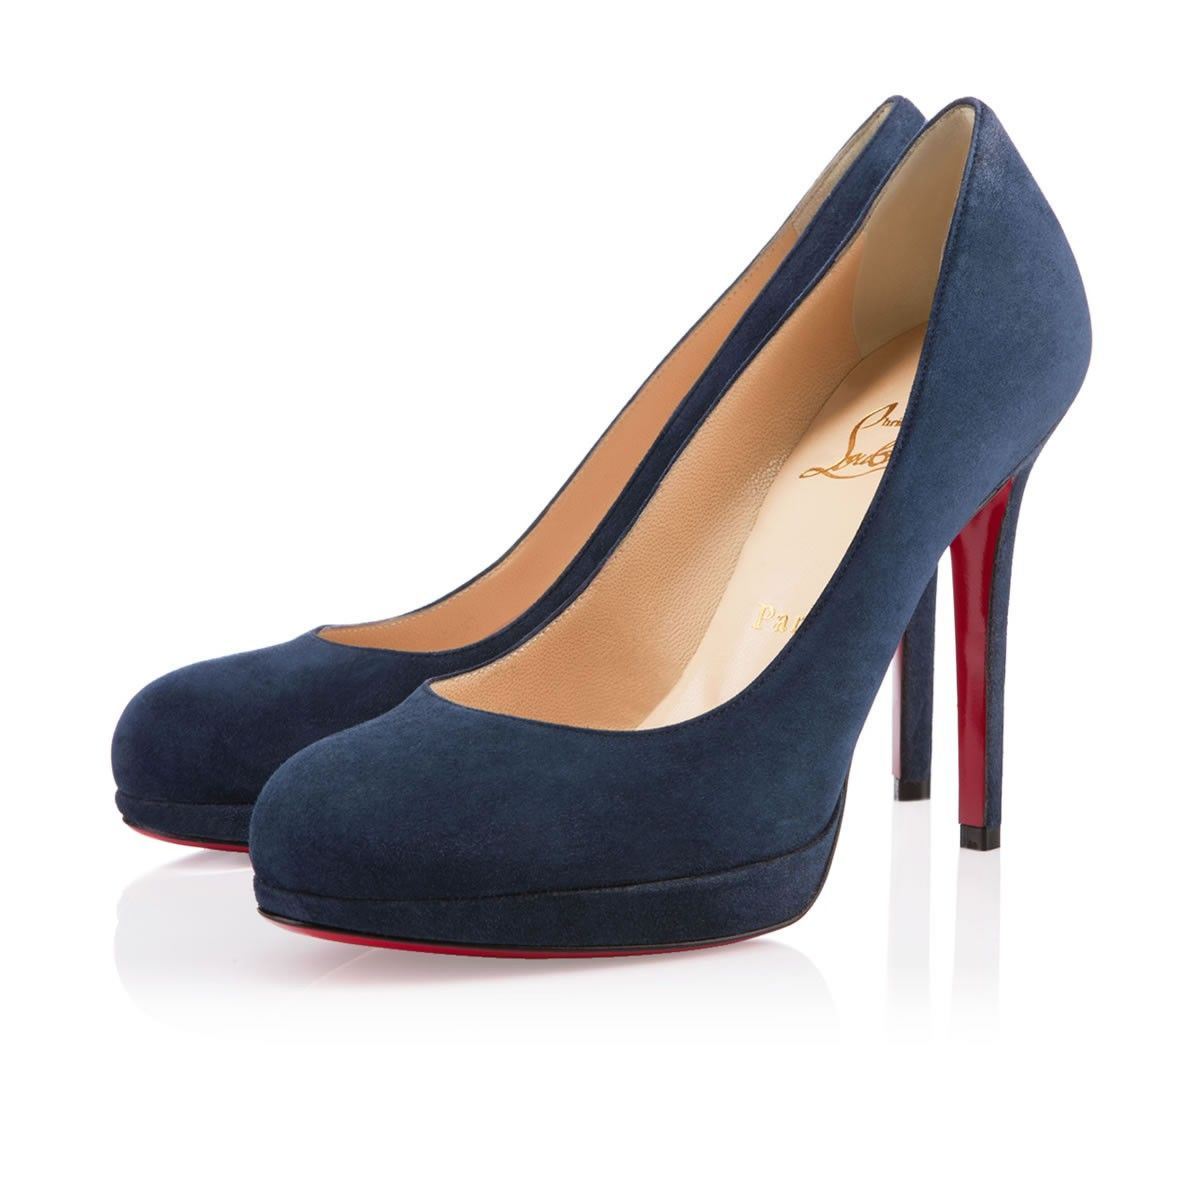 chaussures louboutin bleu marine